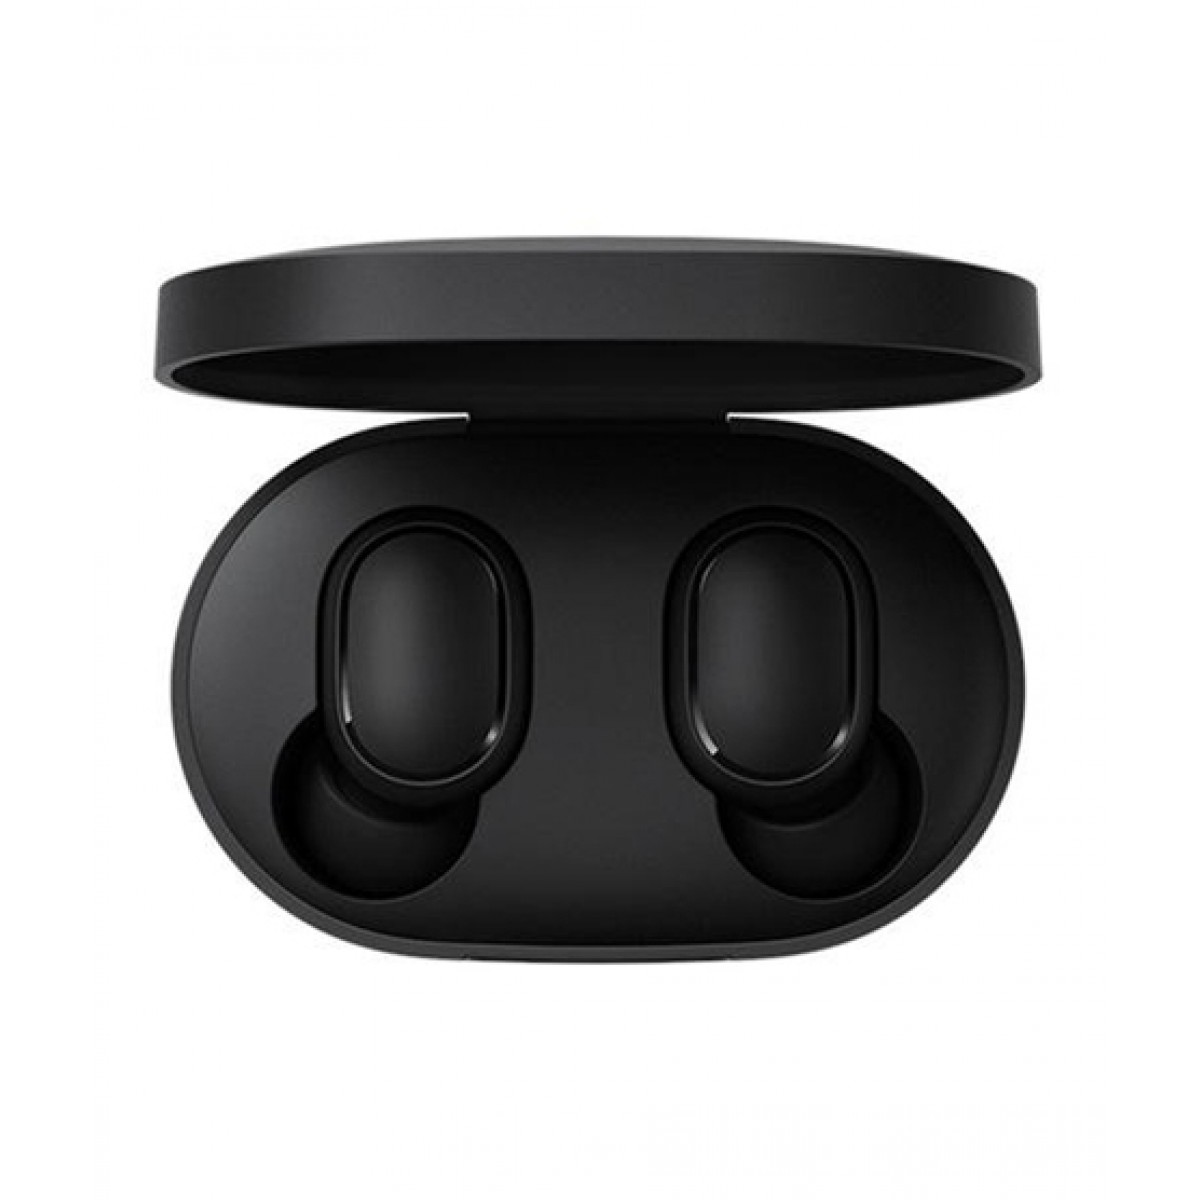 Xiaomi Redmi AirDots Wireless Bluetooth Earbuds Black